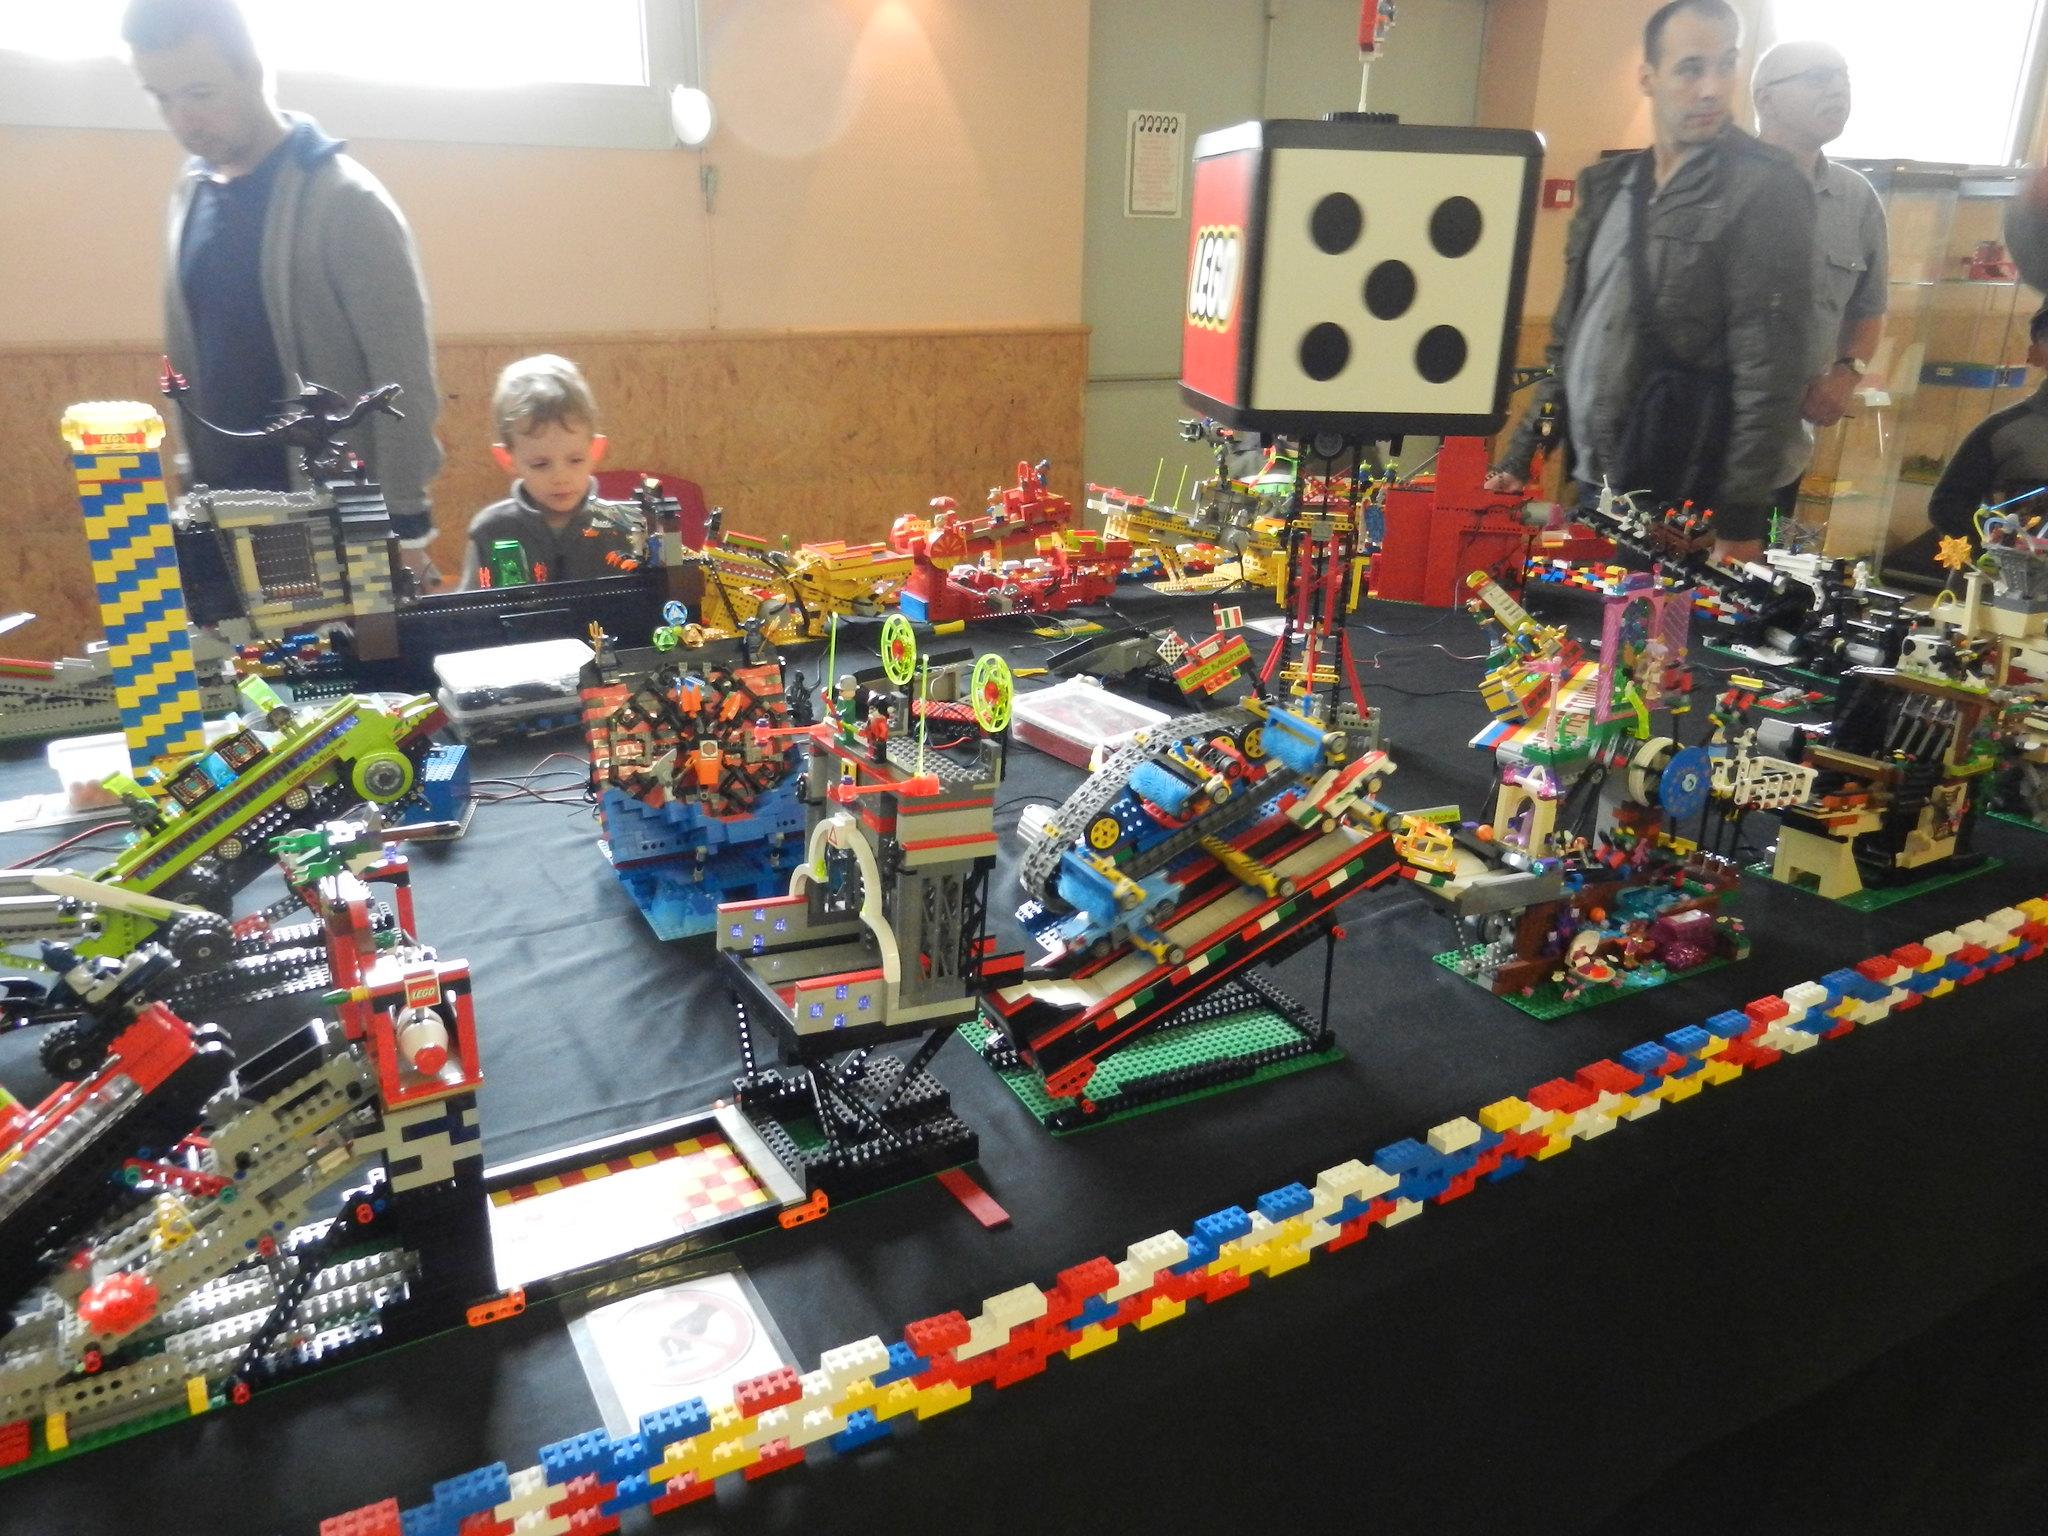 [Expo] Compte-rendu de la Briqu'Expo de Mulsanne 18795108245_efaa222738_k